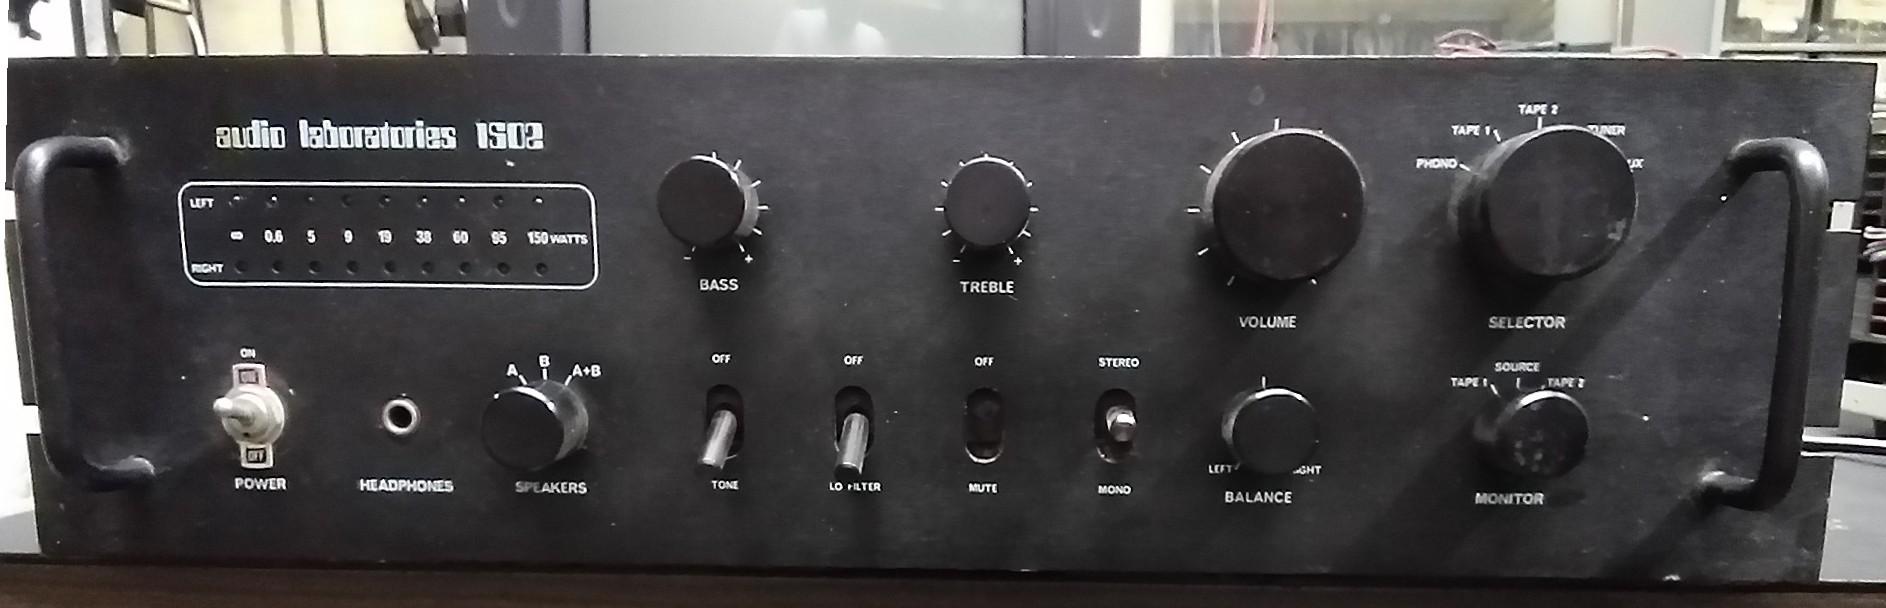 PA amplifier equipment